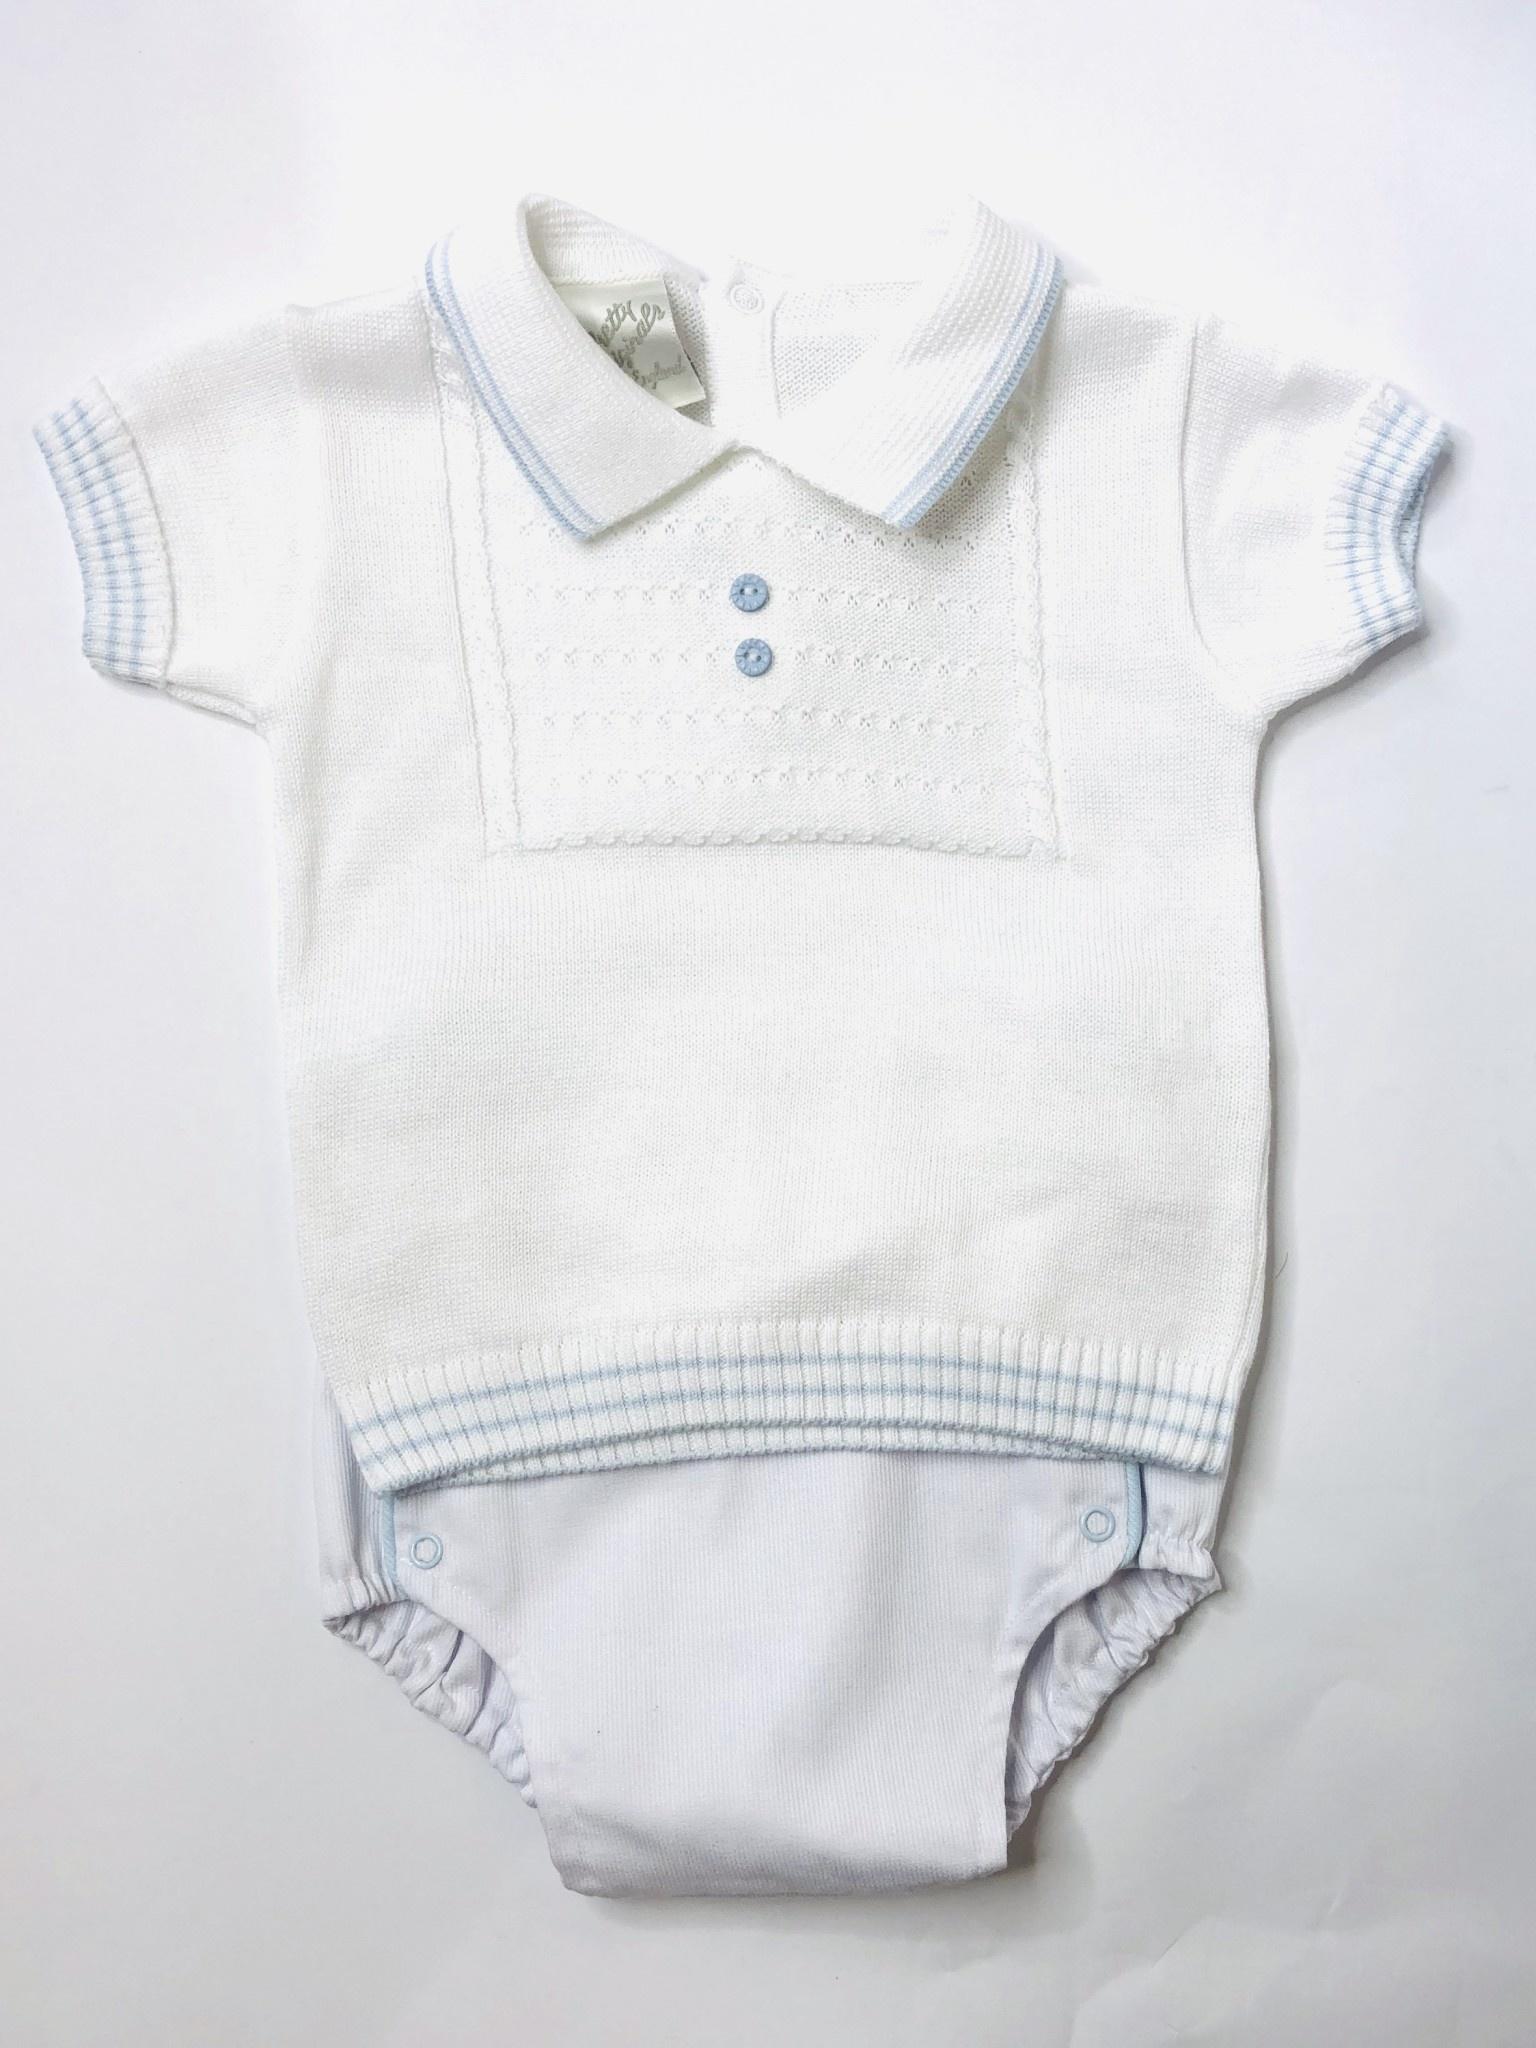 Pretty Originals Pretty Originals Boys White Knit Top & Pant Set